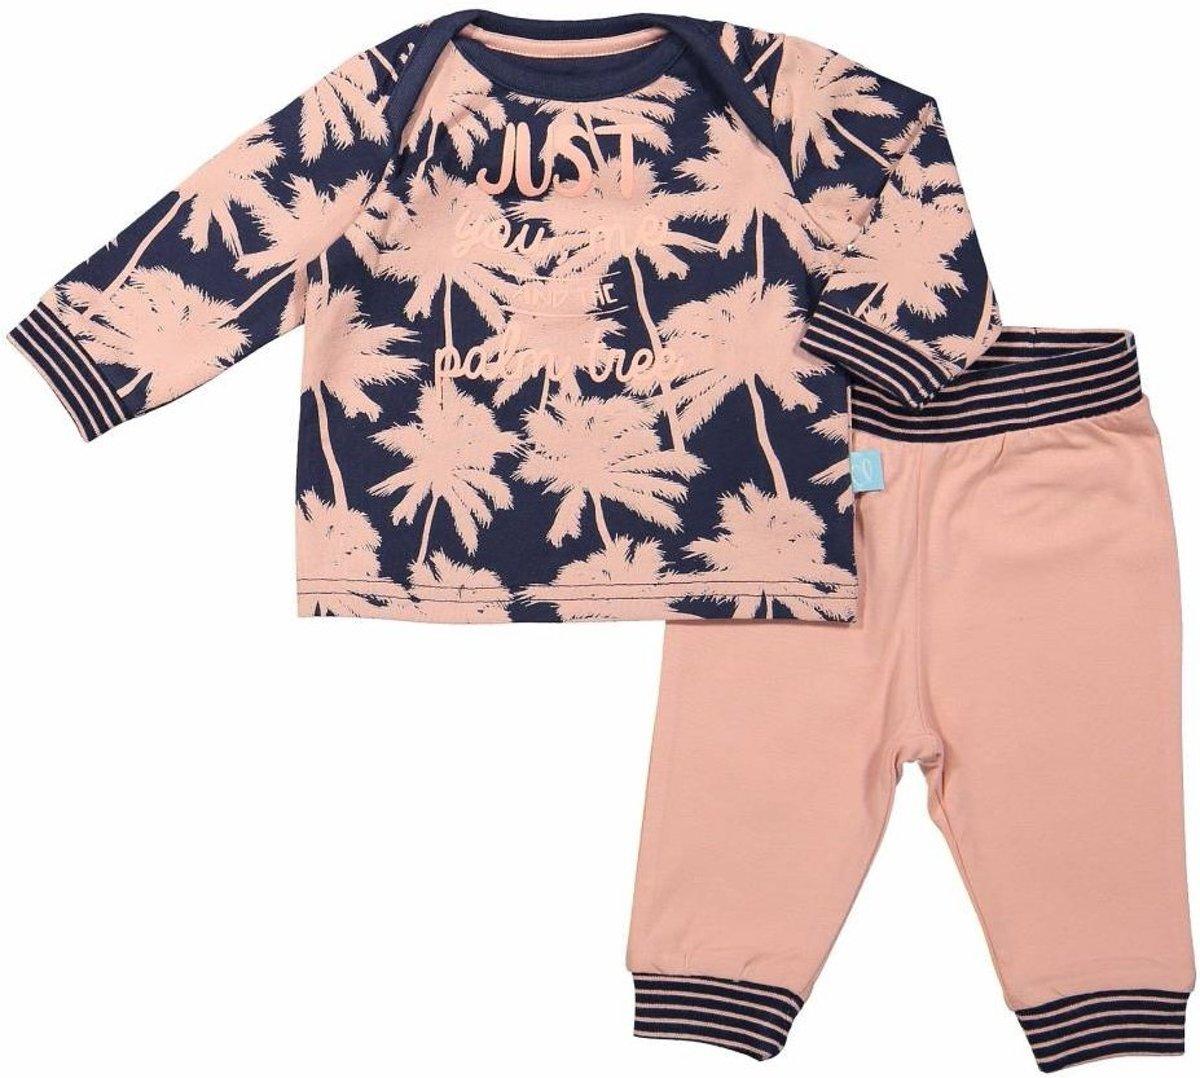 62 - Charlie Choe baby pyjama lounge set Pink Palmtrees Maat: 62 kopen